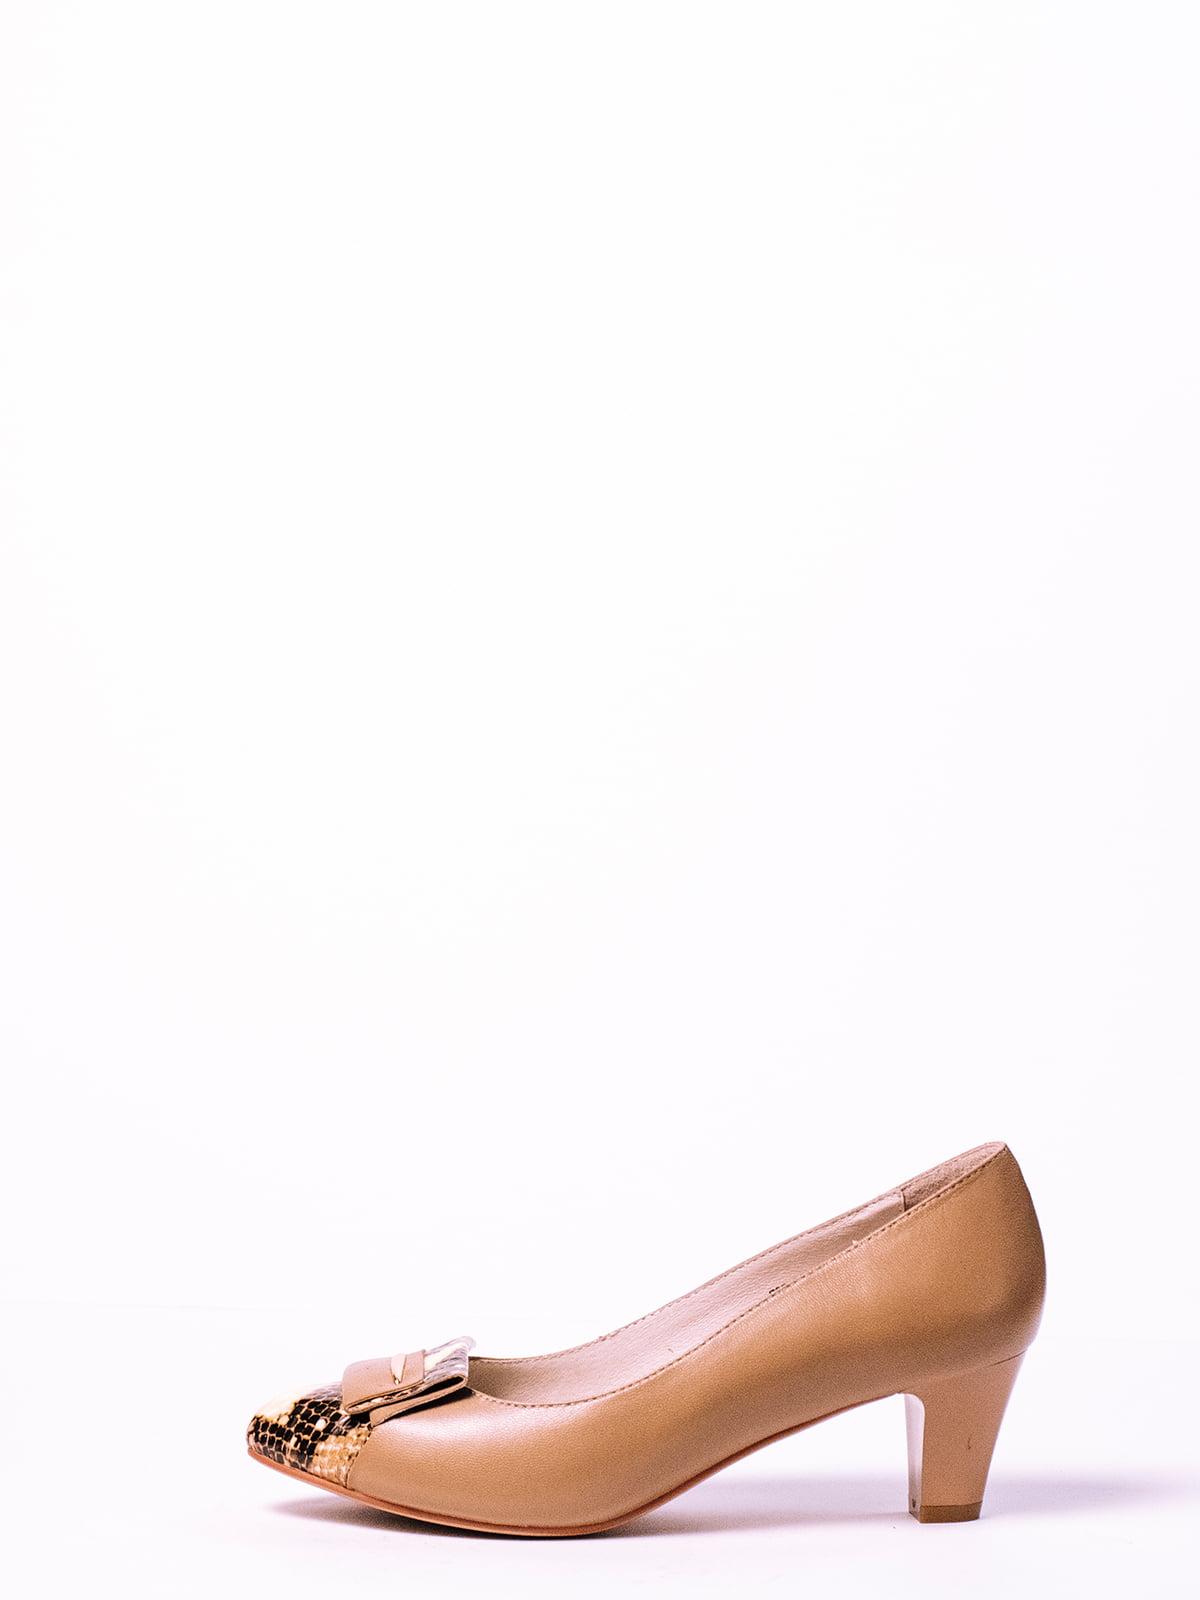 Туфли бежевые | 4860370 | фото 2